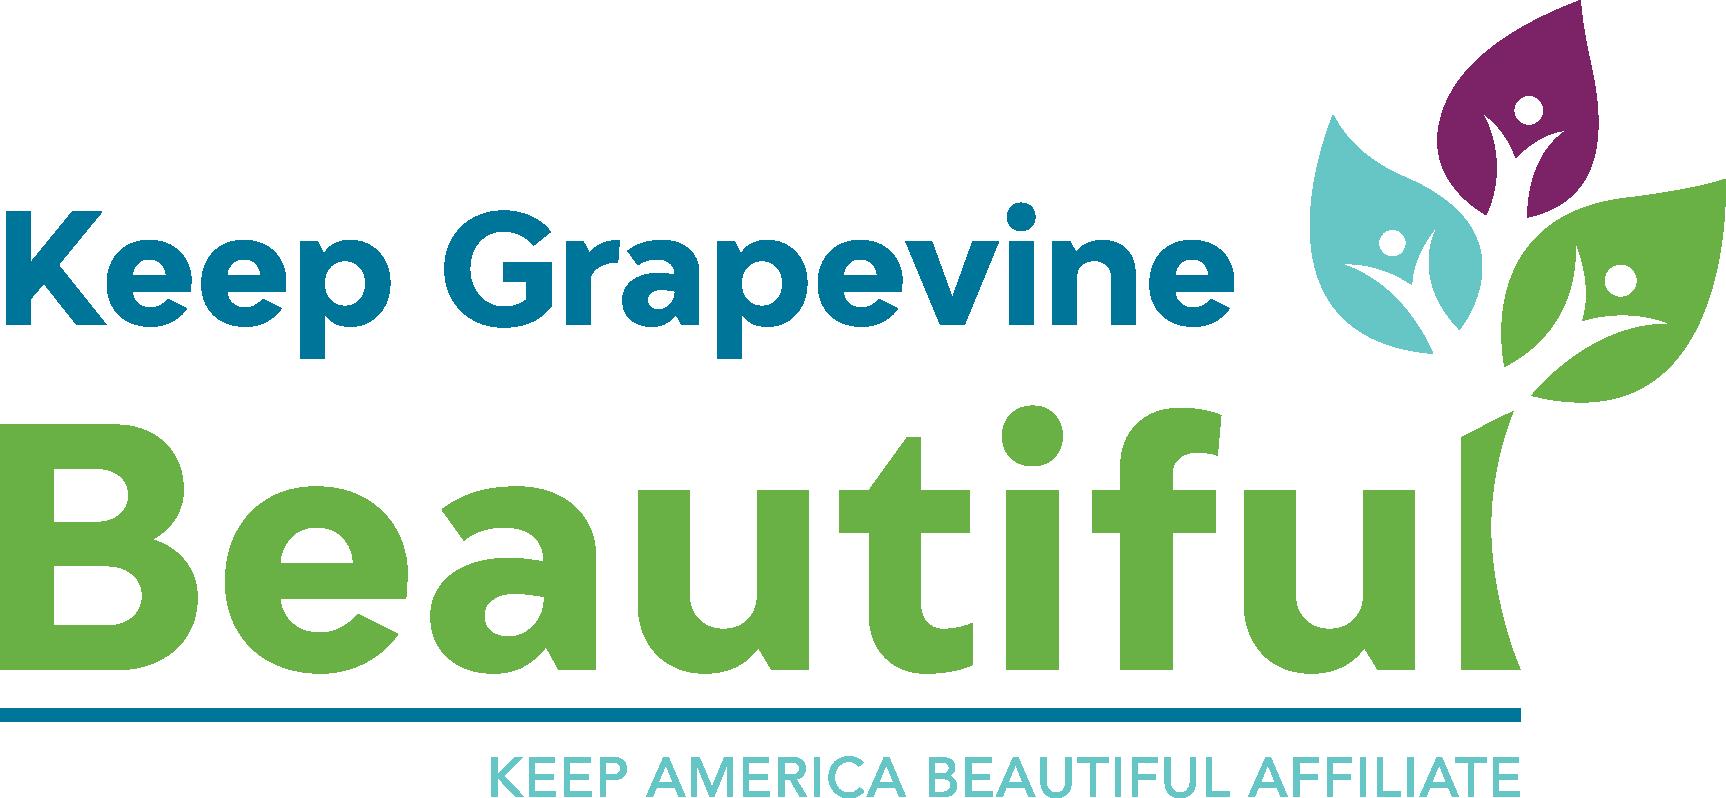 Keep Grapevine Beautiful